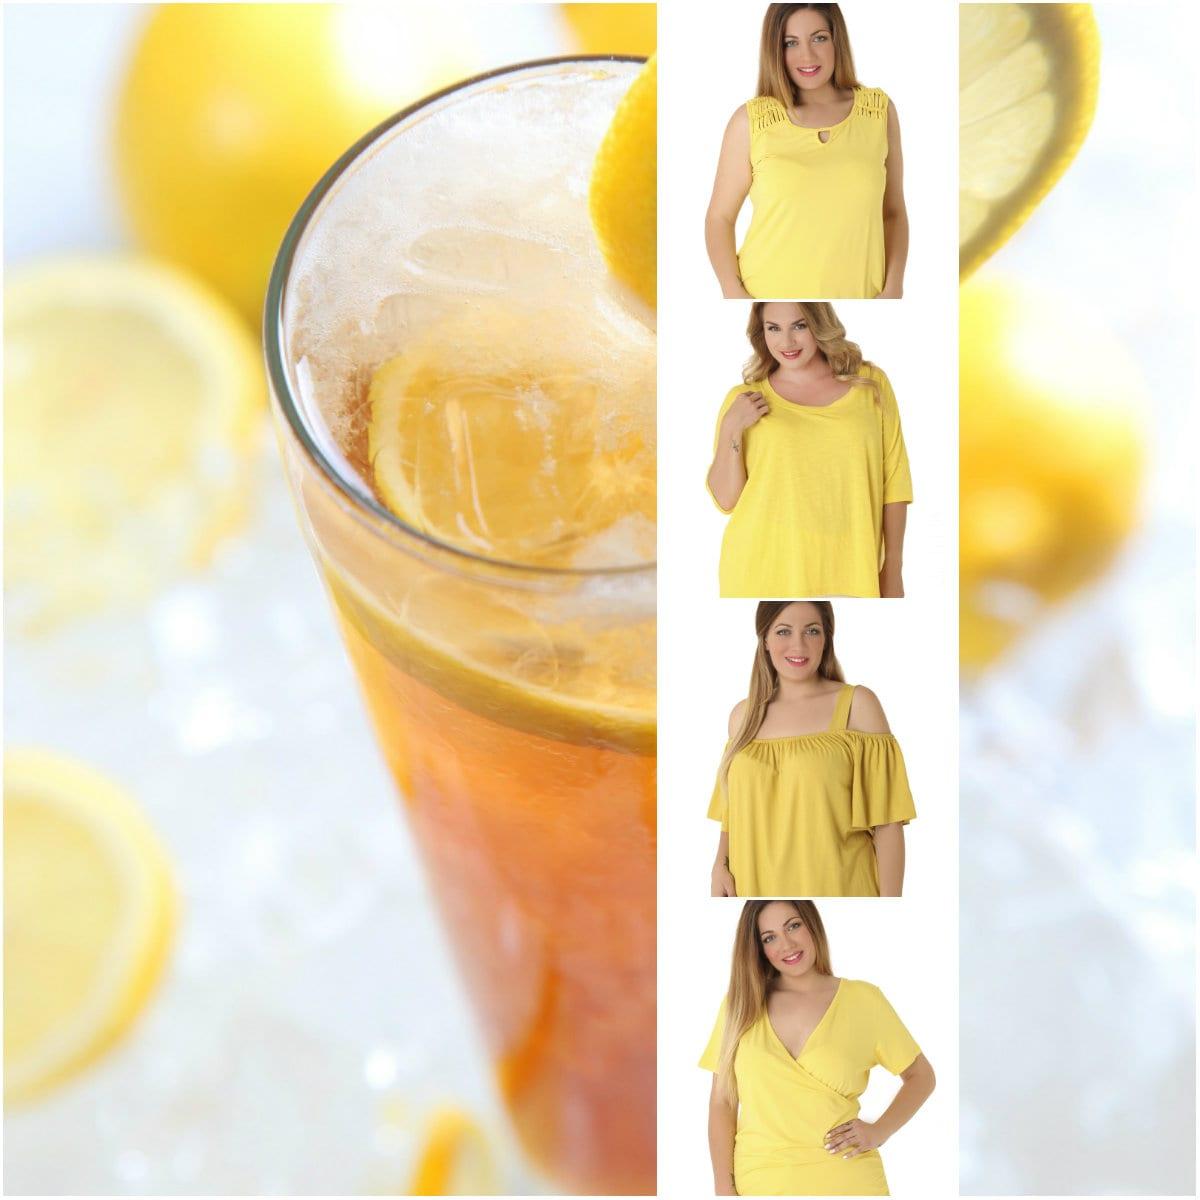 Lemon colors - Yellow tops